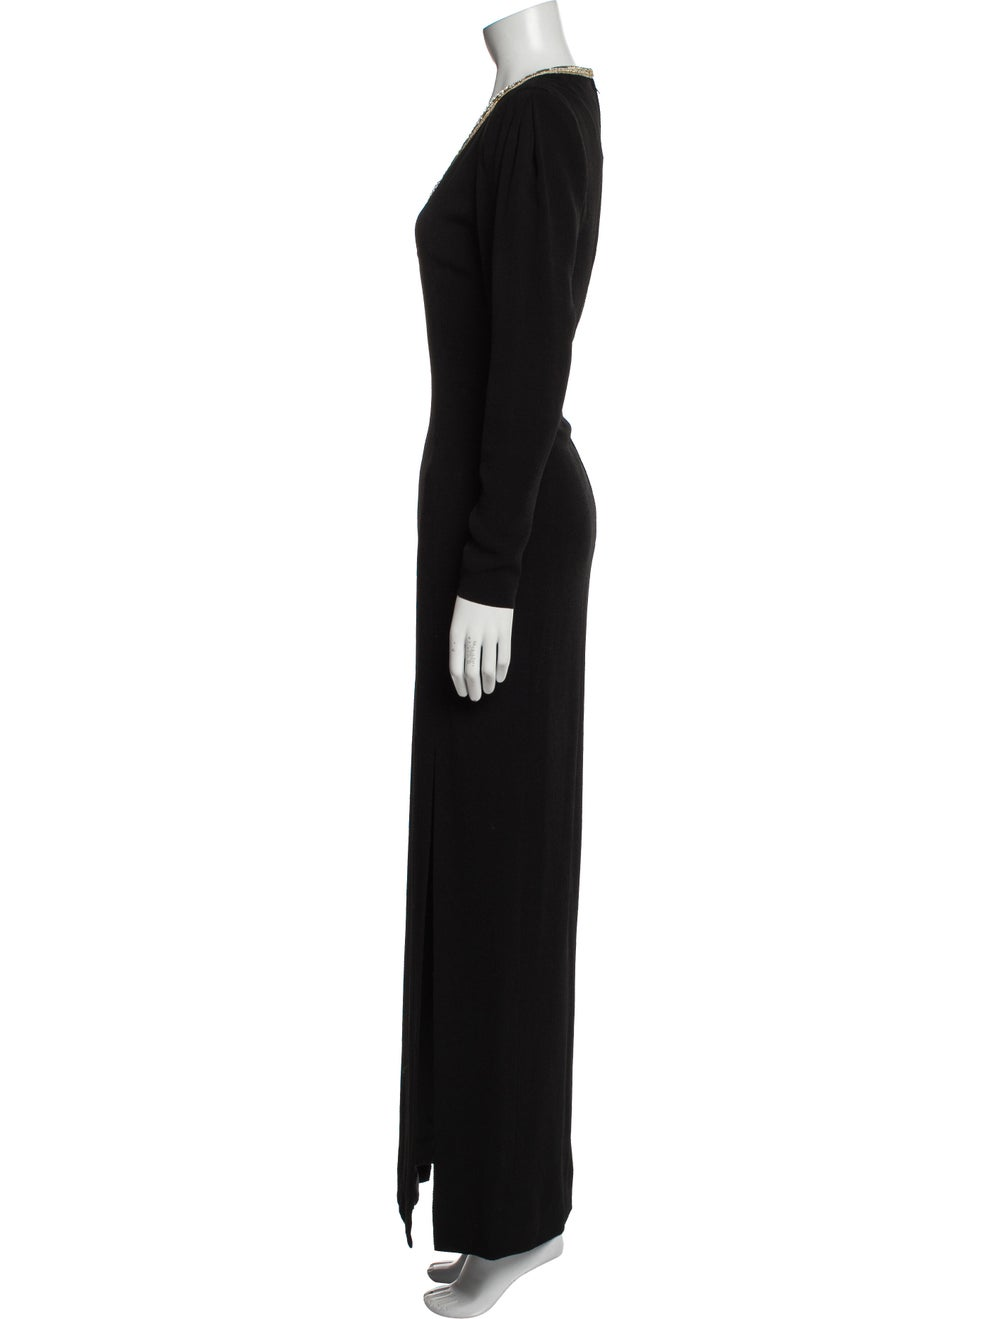 Pauline Trigere Vintage Long Dress Black - image 2